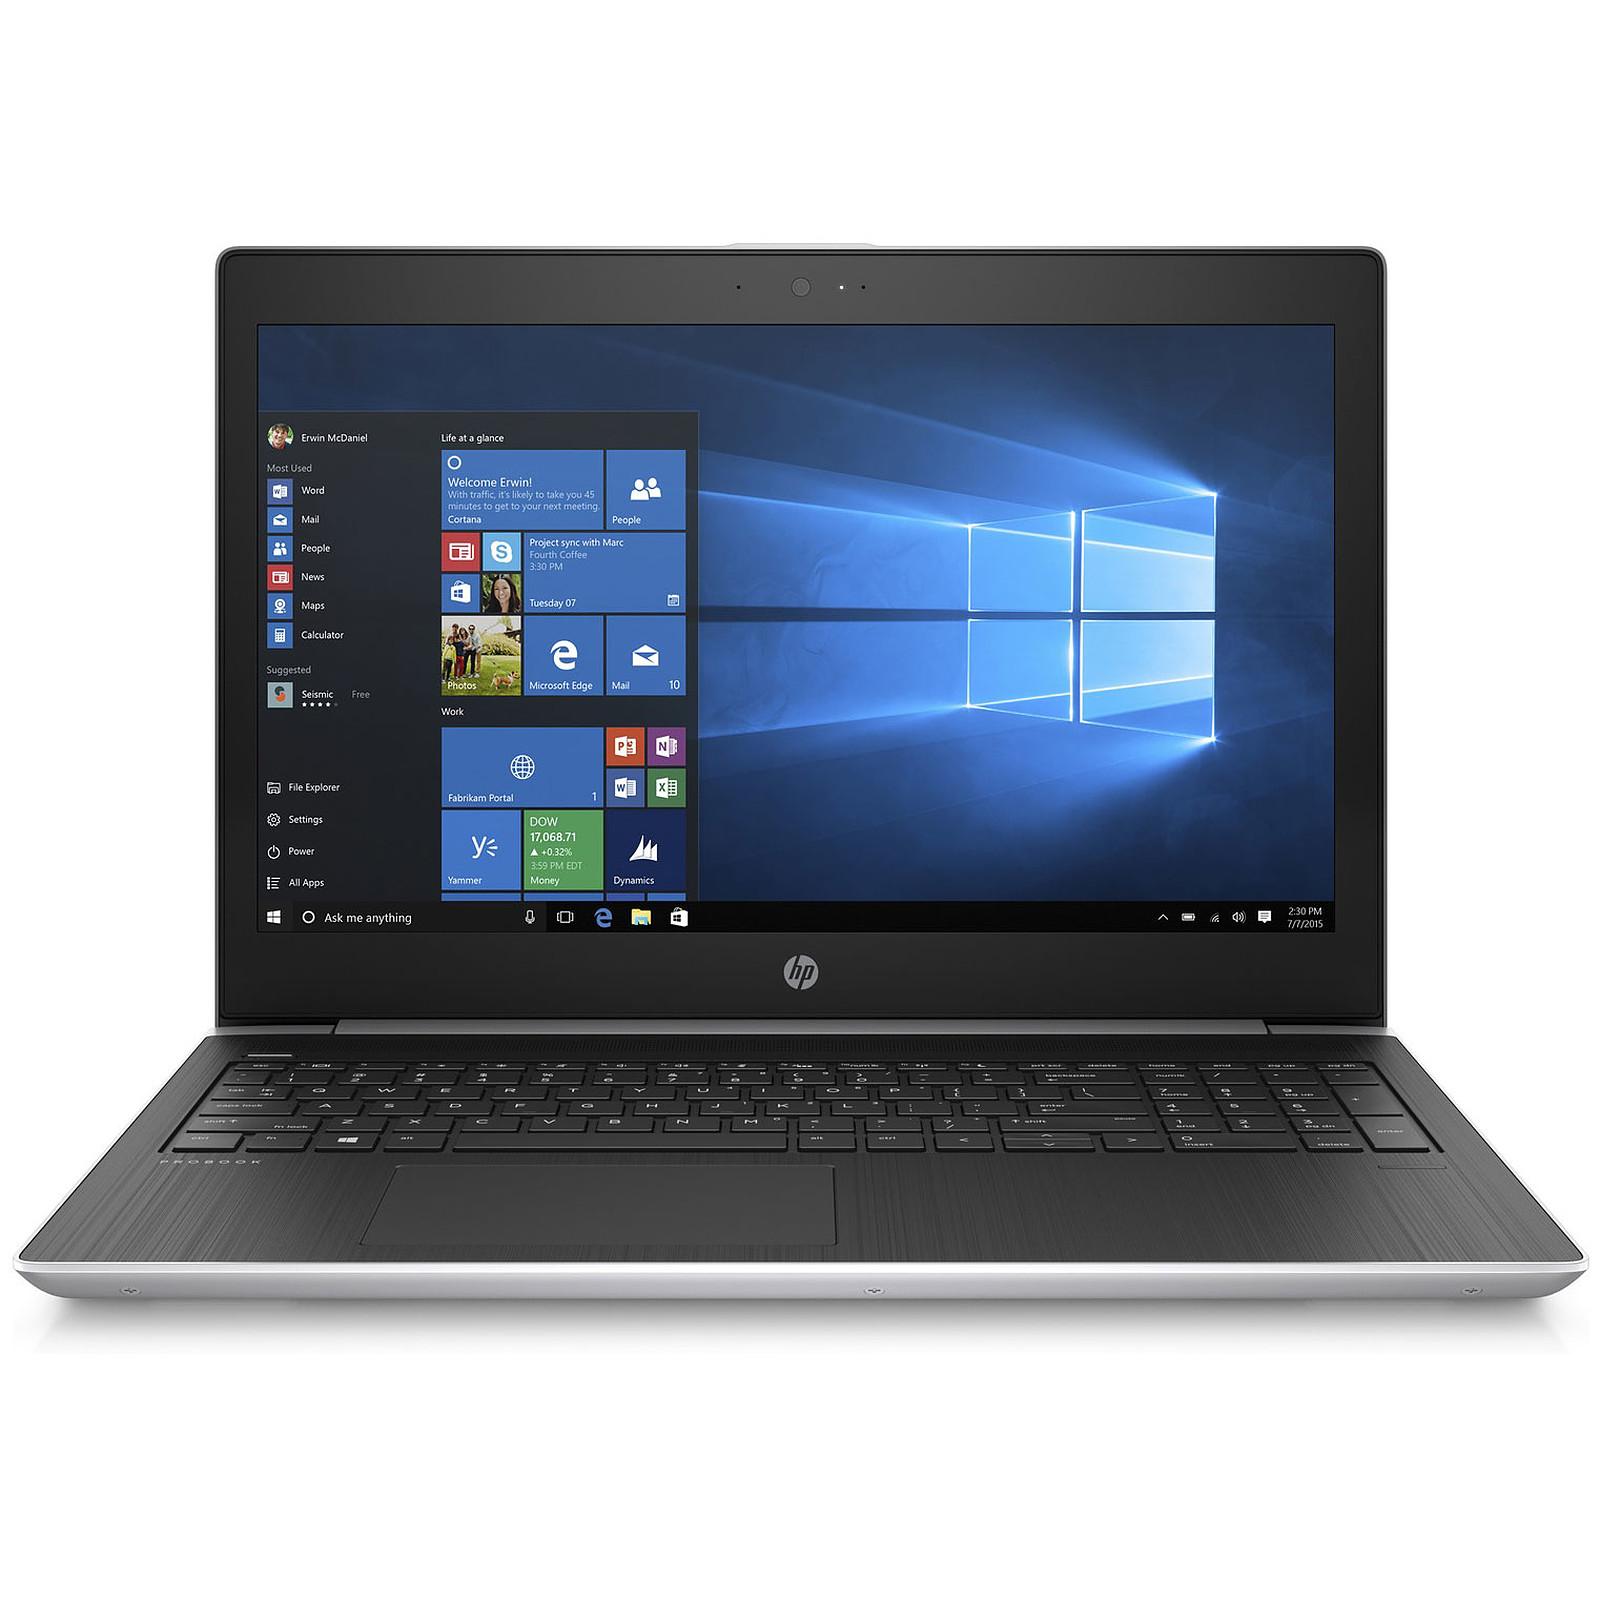 8fcfc6337ff797 HP ProBook 450 G5 (2XY35EA) - PC portable HP sur LDLC.com